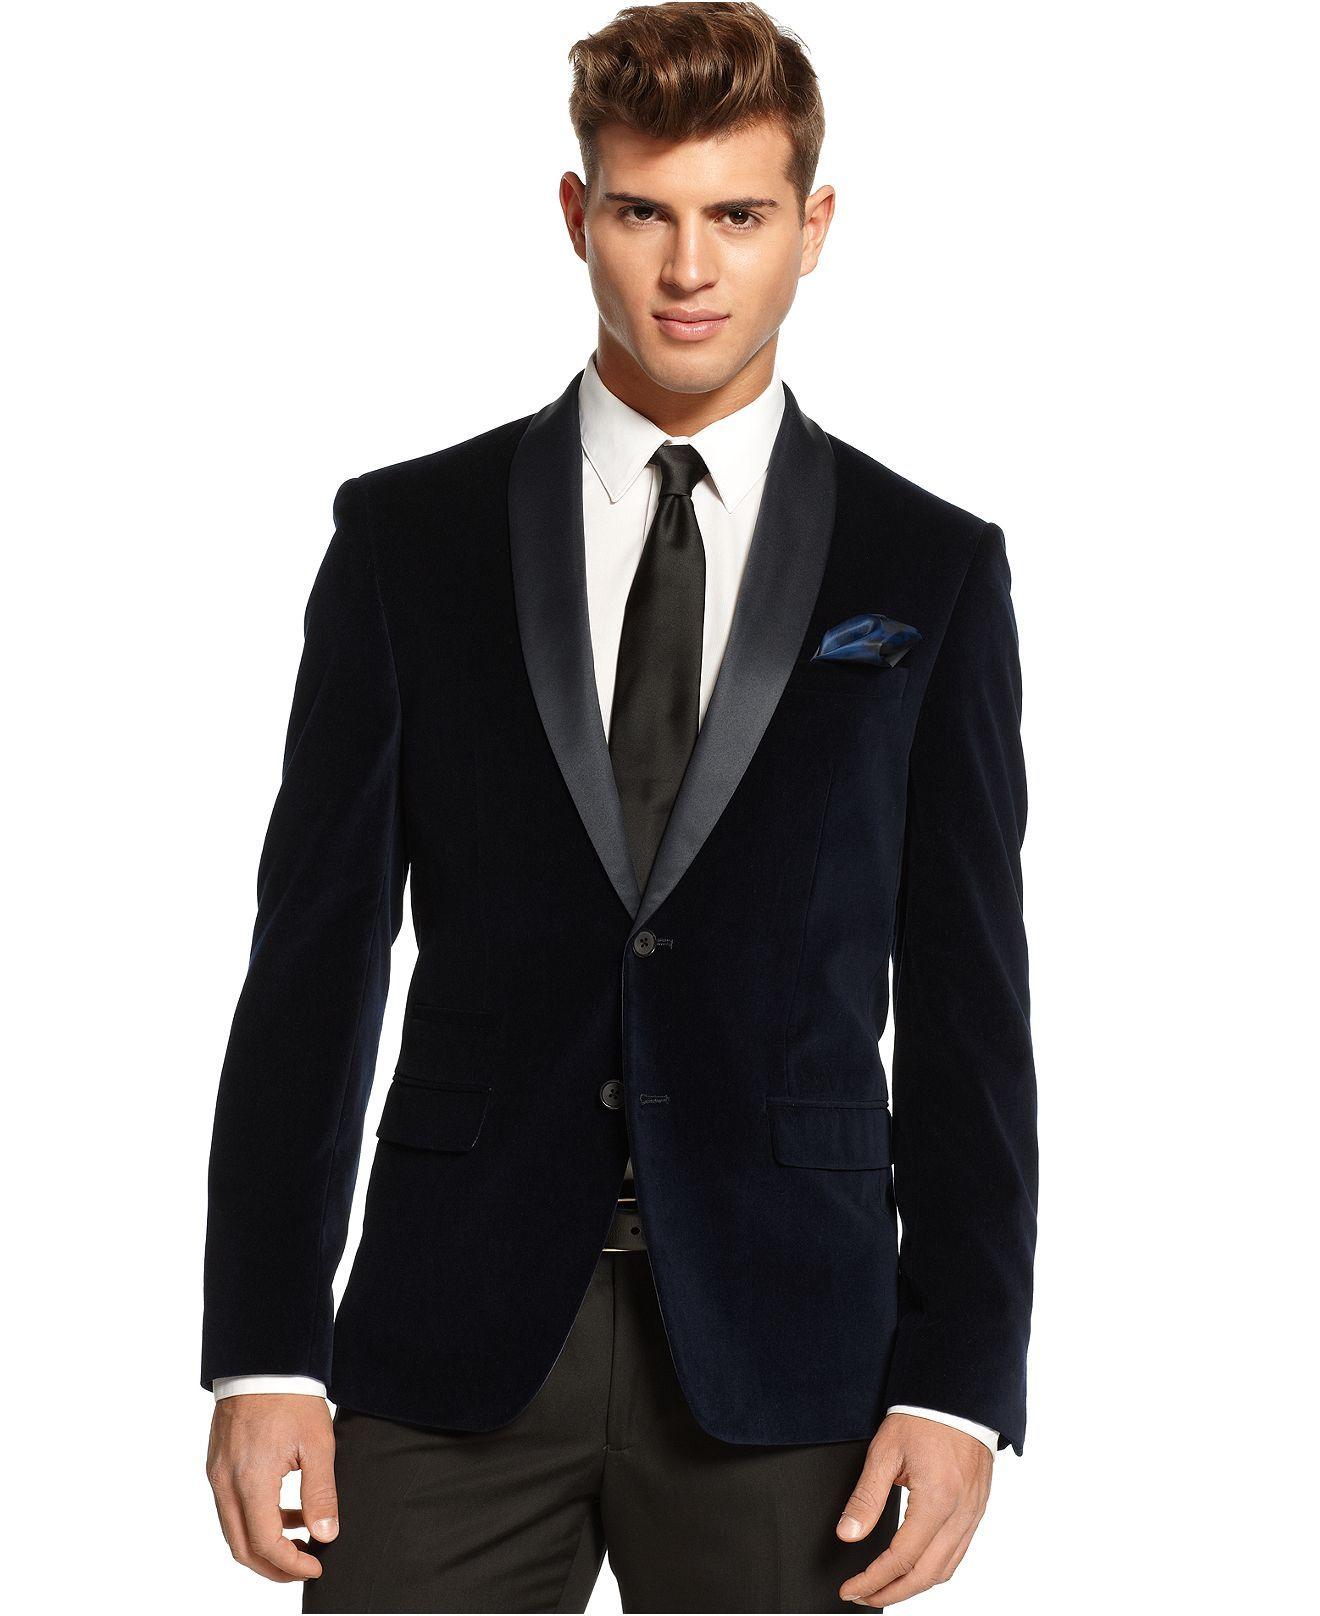 M151 Jacket, Satin Lapel Suede Blazer - Blazers & Sport Coats ...